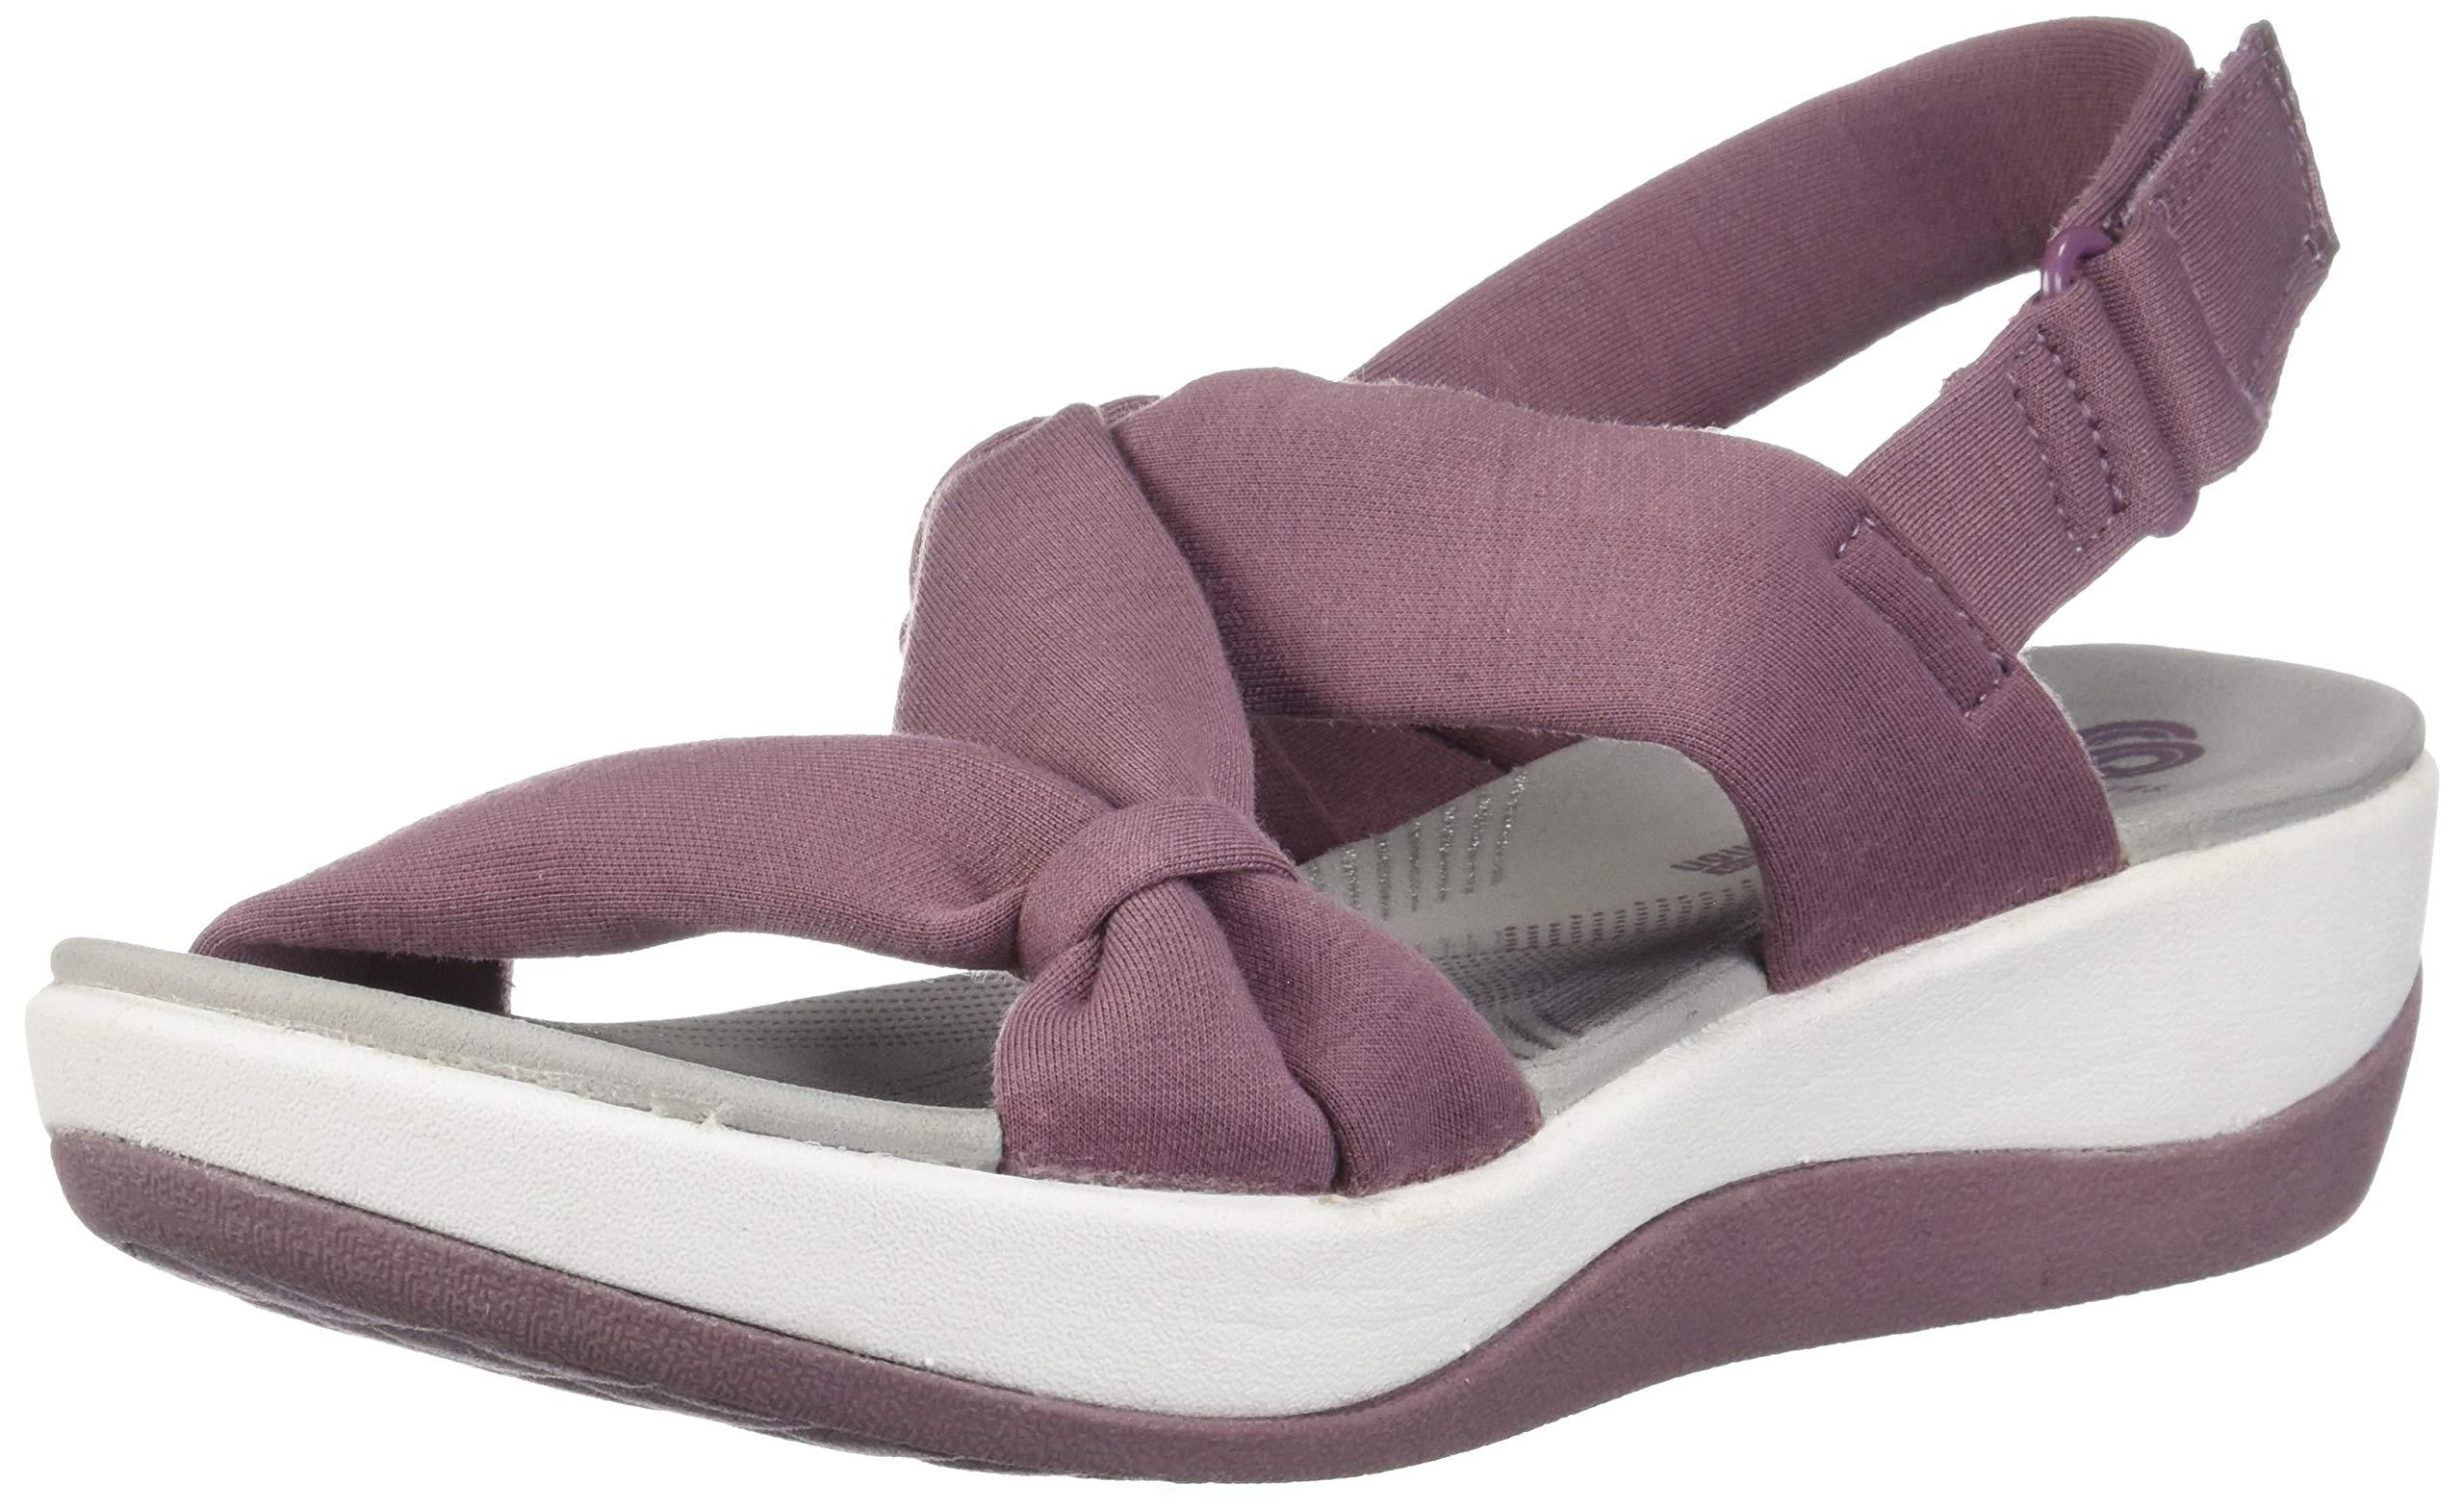 CLARKS Womens Primrose Sandal Textile